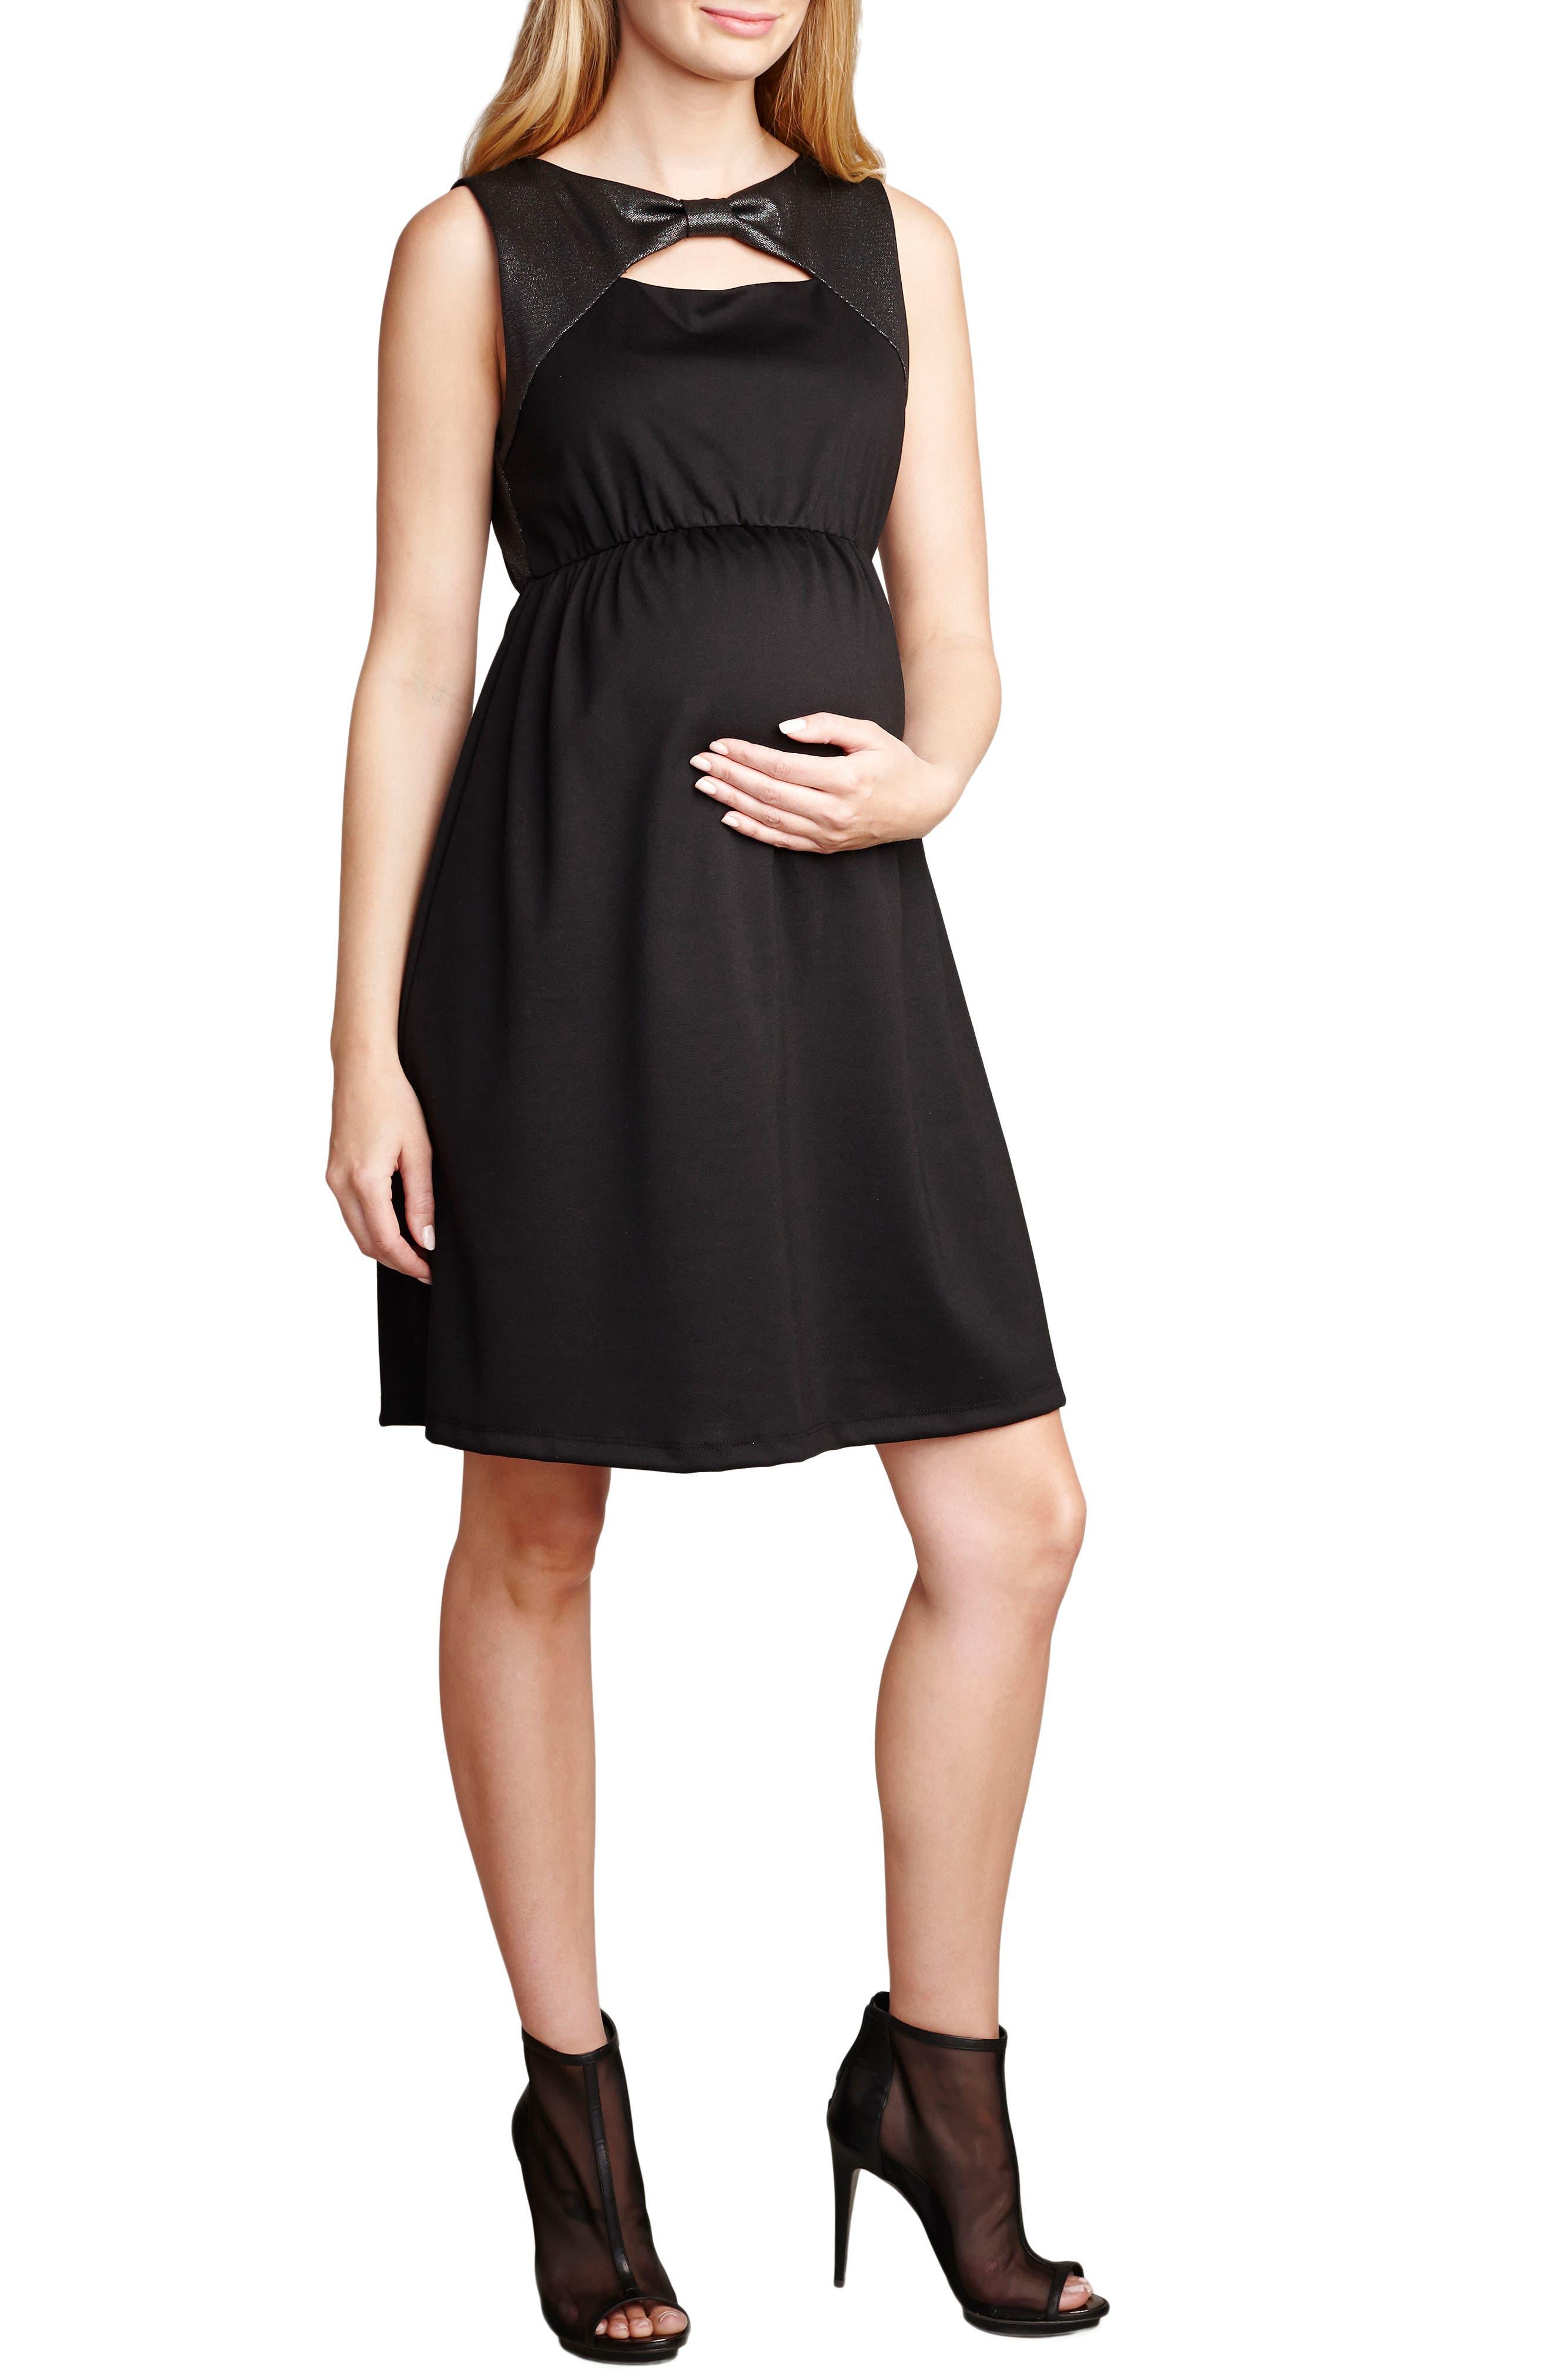 Maternal America Bow Shift Dress, Black